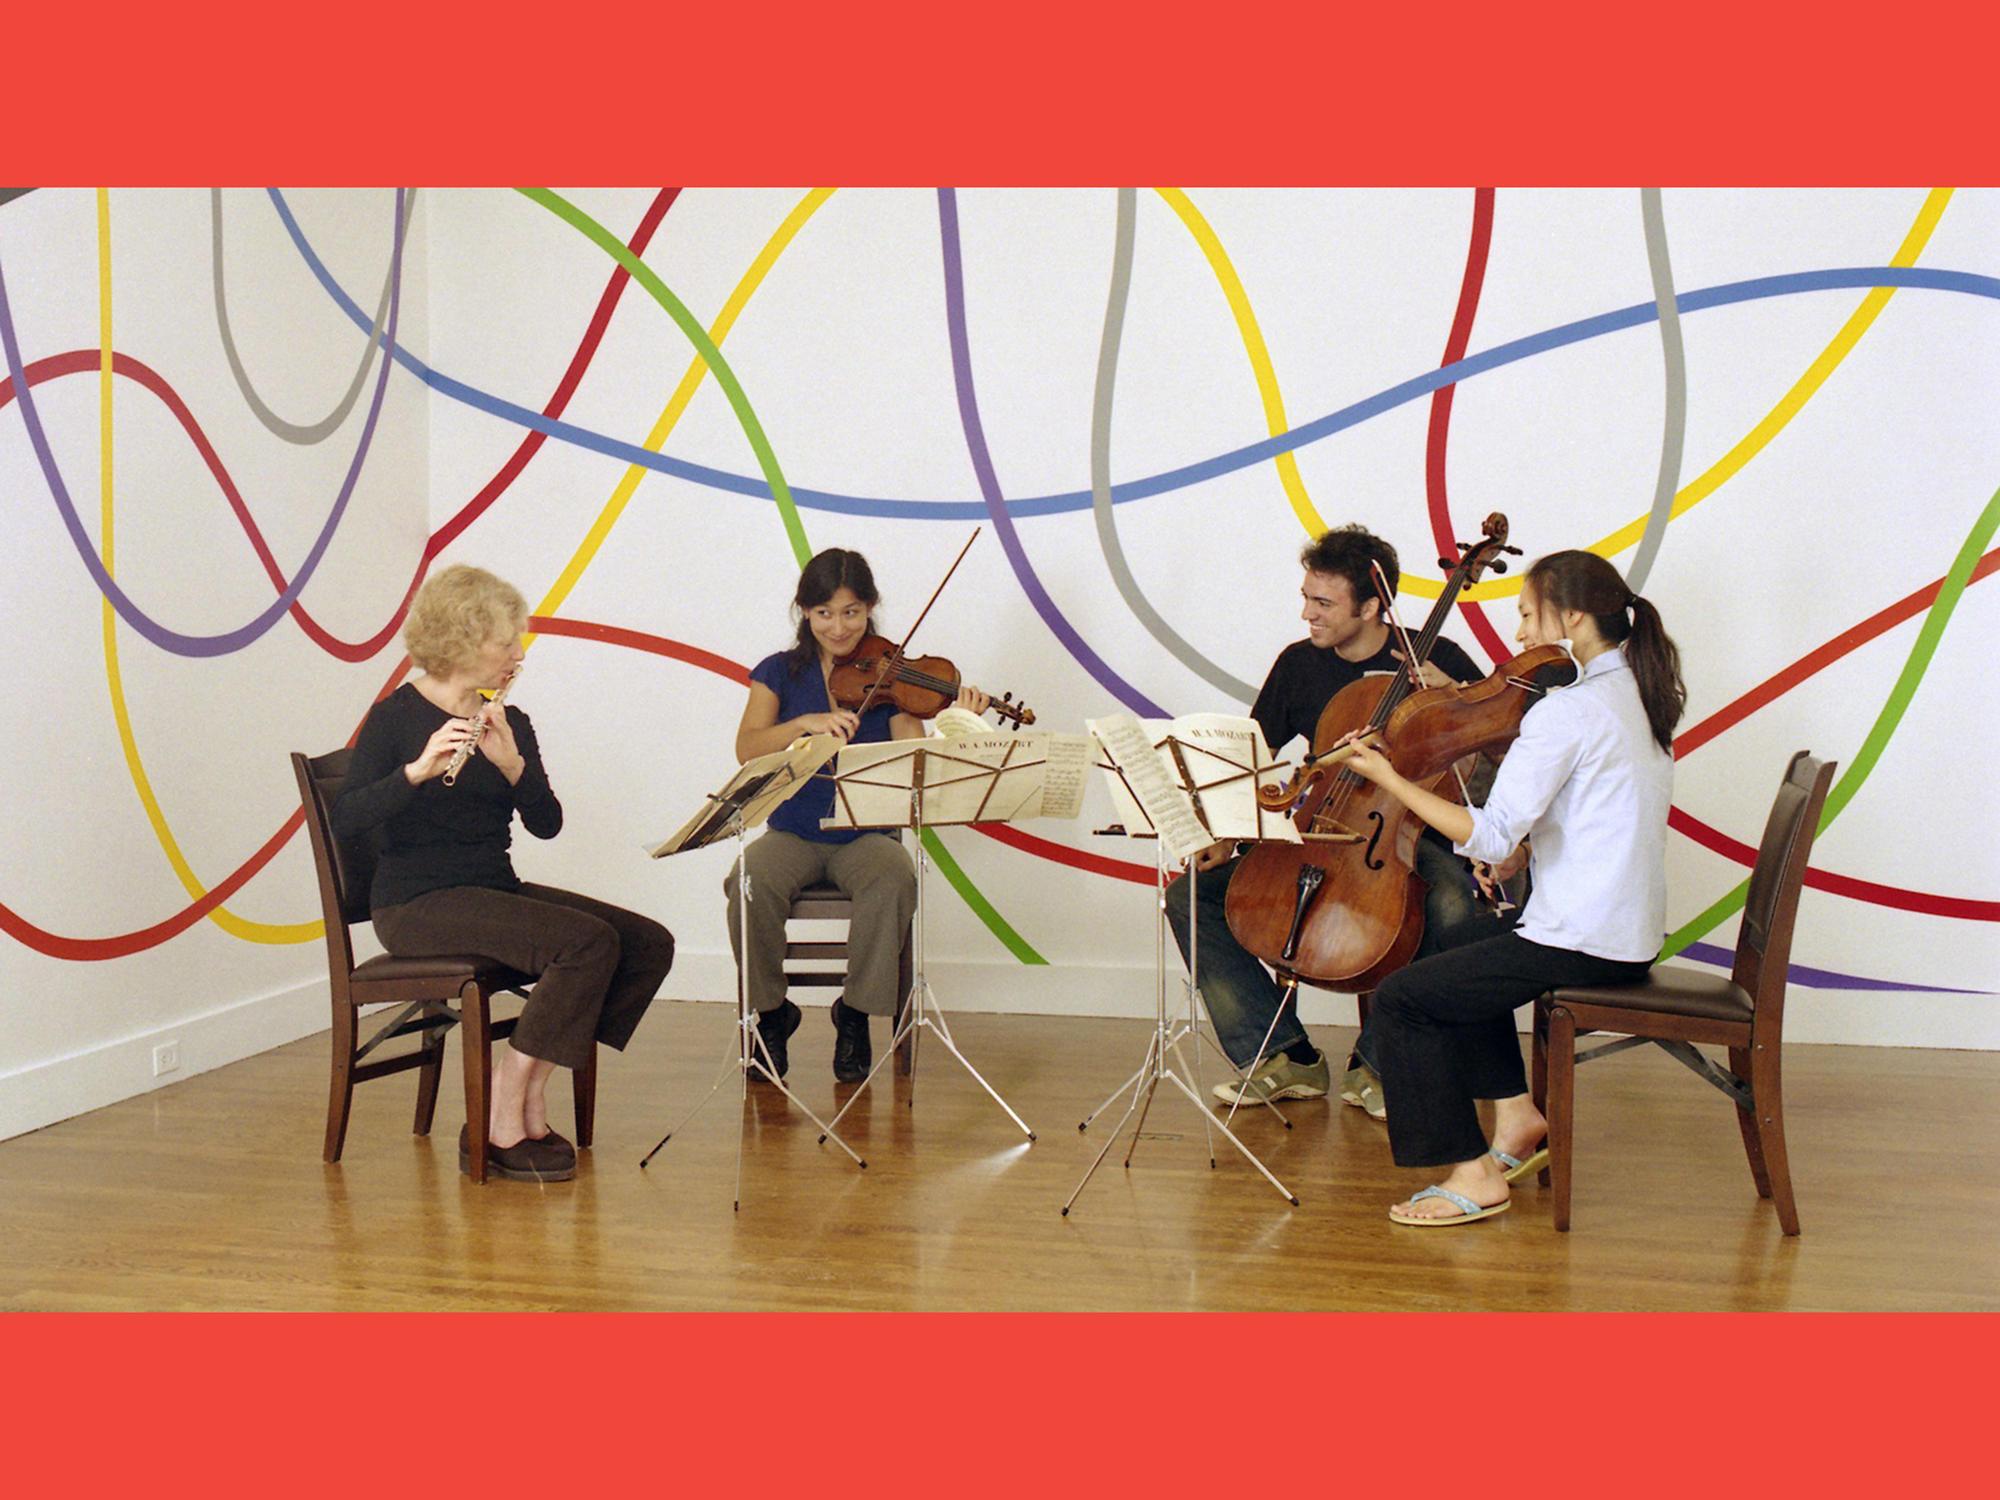 Variations on a Theme by Sol LeWitt & Paula Robison, 2005, Mozart Flute Quartet in D Major K. 285 performed by Paula Robison, flute, Harumi Rhodes, violin,Julianne Lee, viola, Eric Jacobsen, cello.